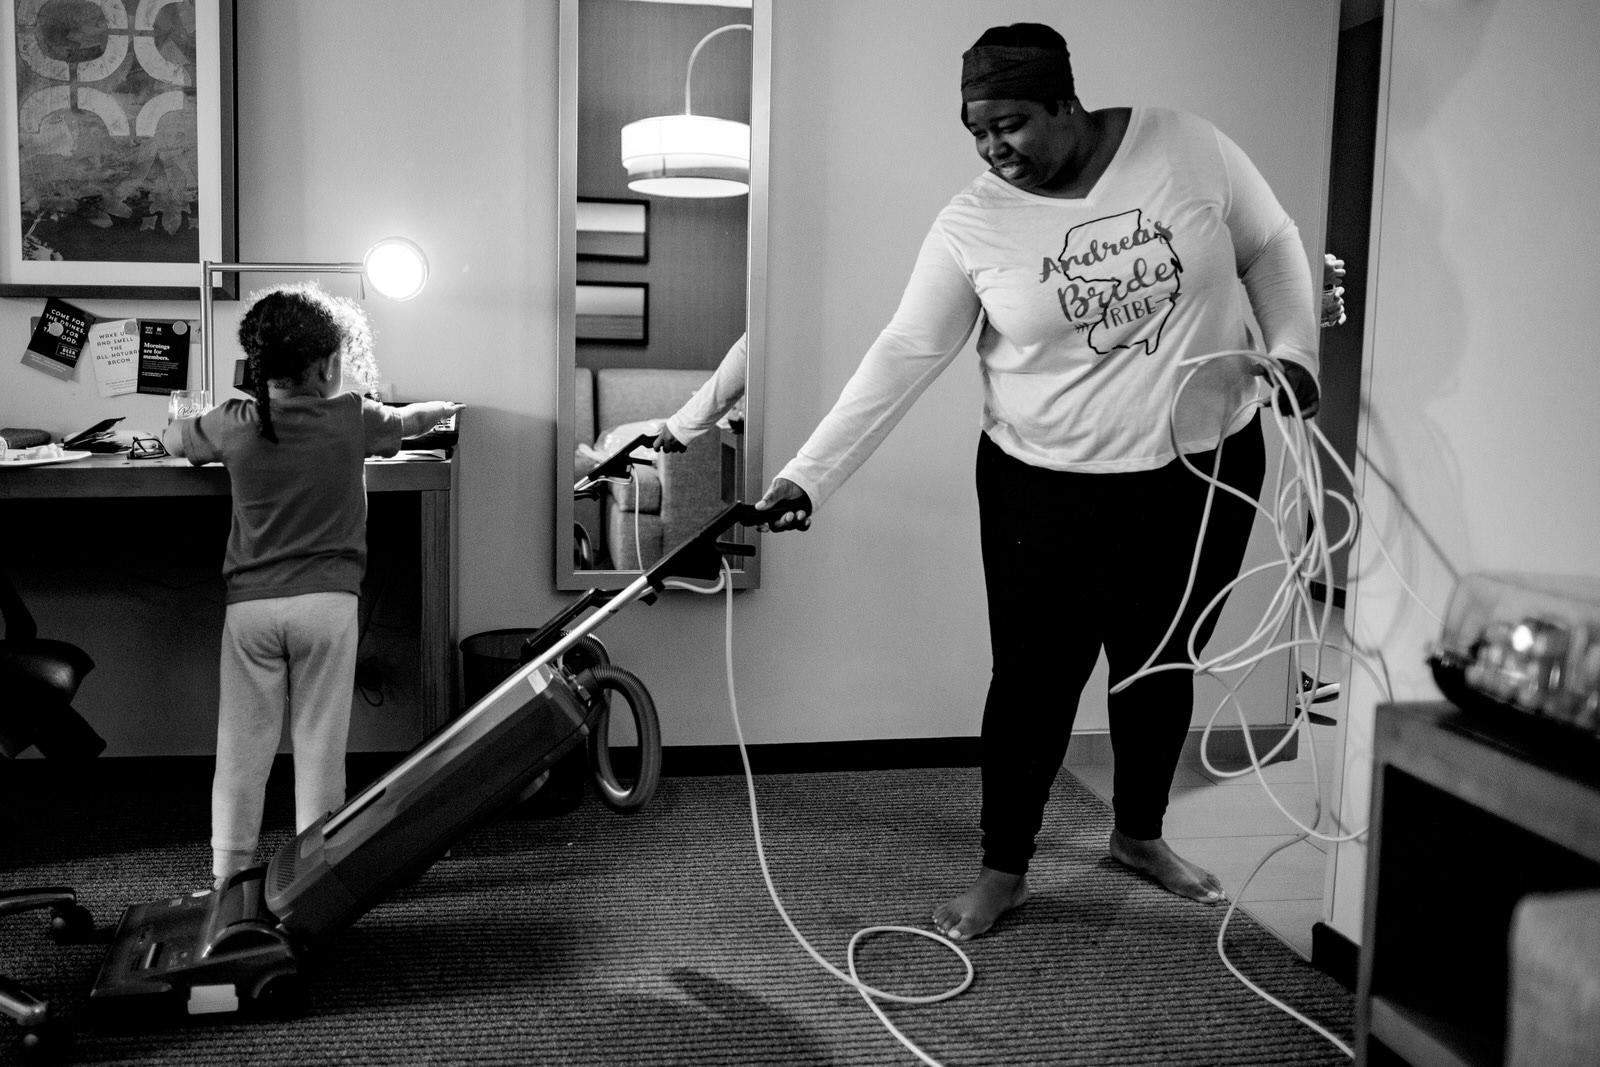 documentary-wedding-photography-tiny-house-photo-bride-vacuuming